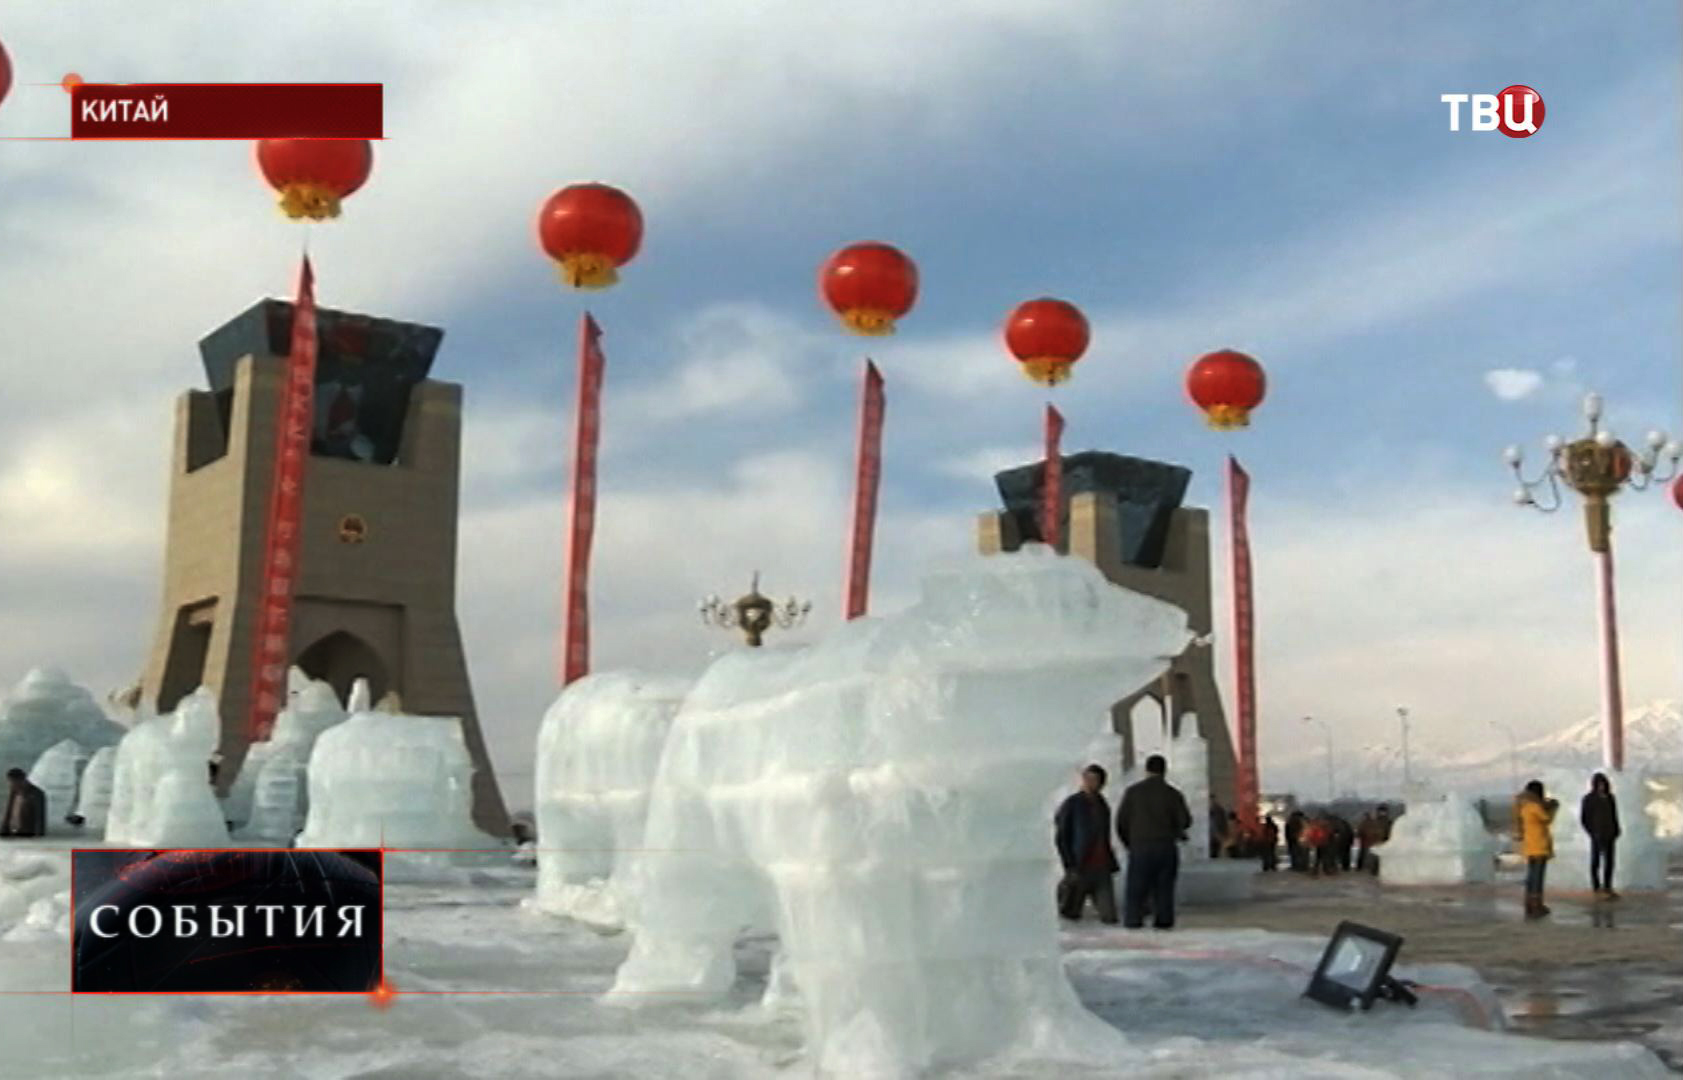 Фестиваль ледяных и снежных фигур